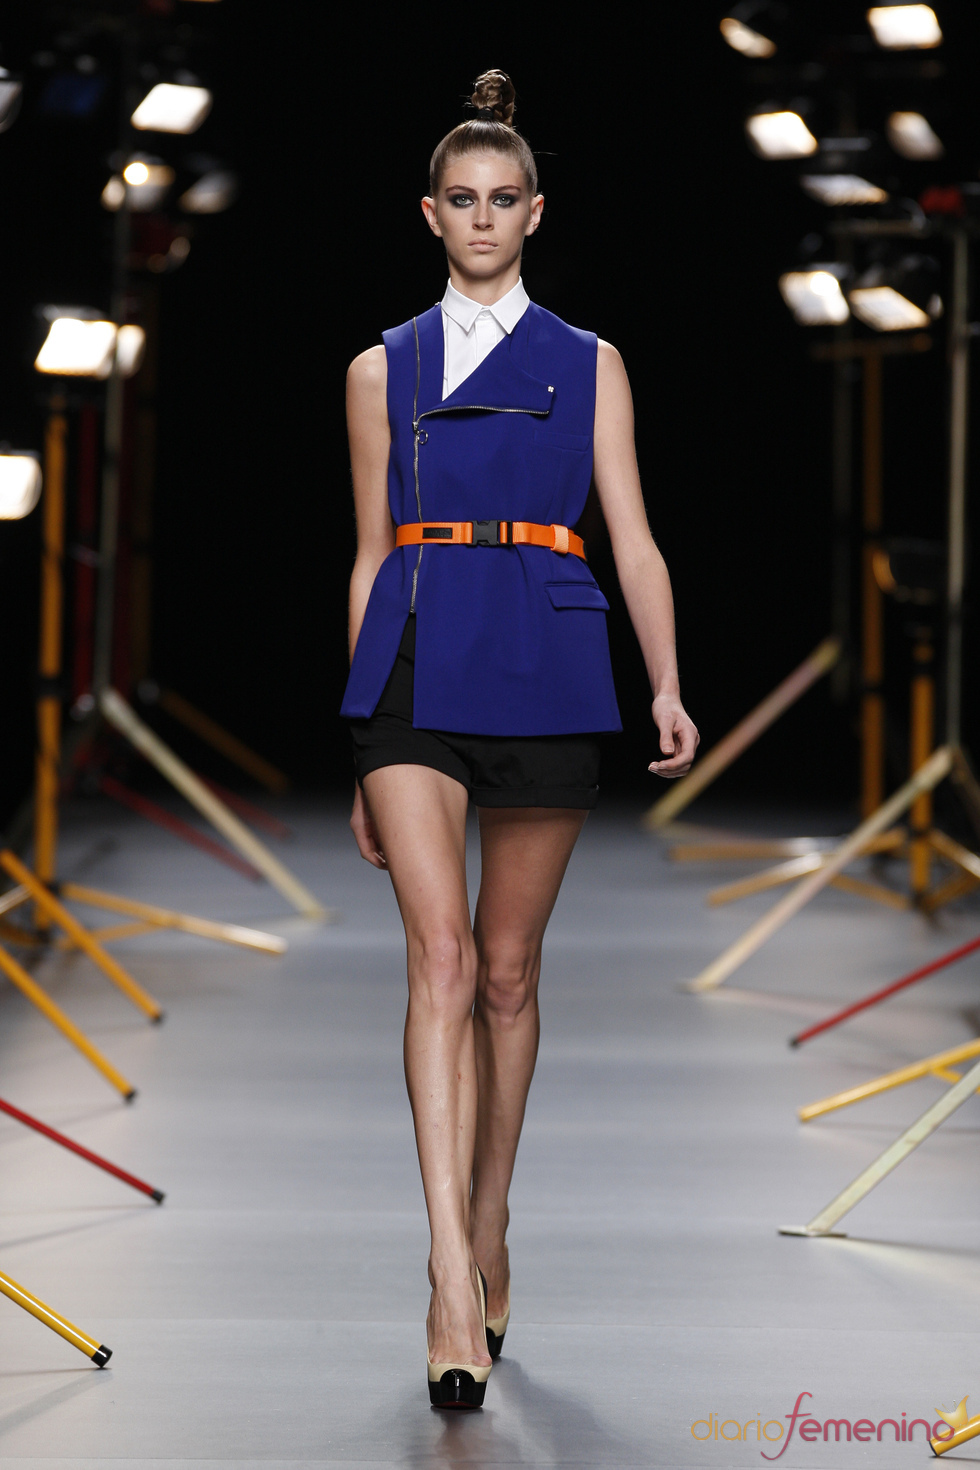 Cibeles Madrid Fashion Week 09-2010: David Delfín